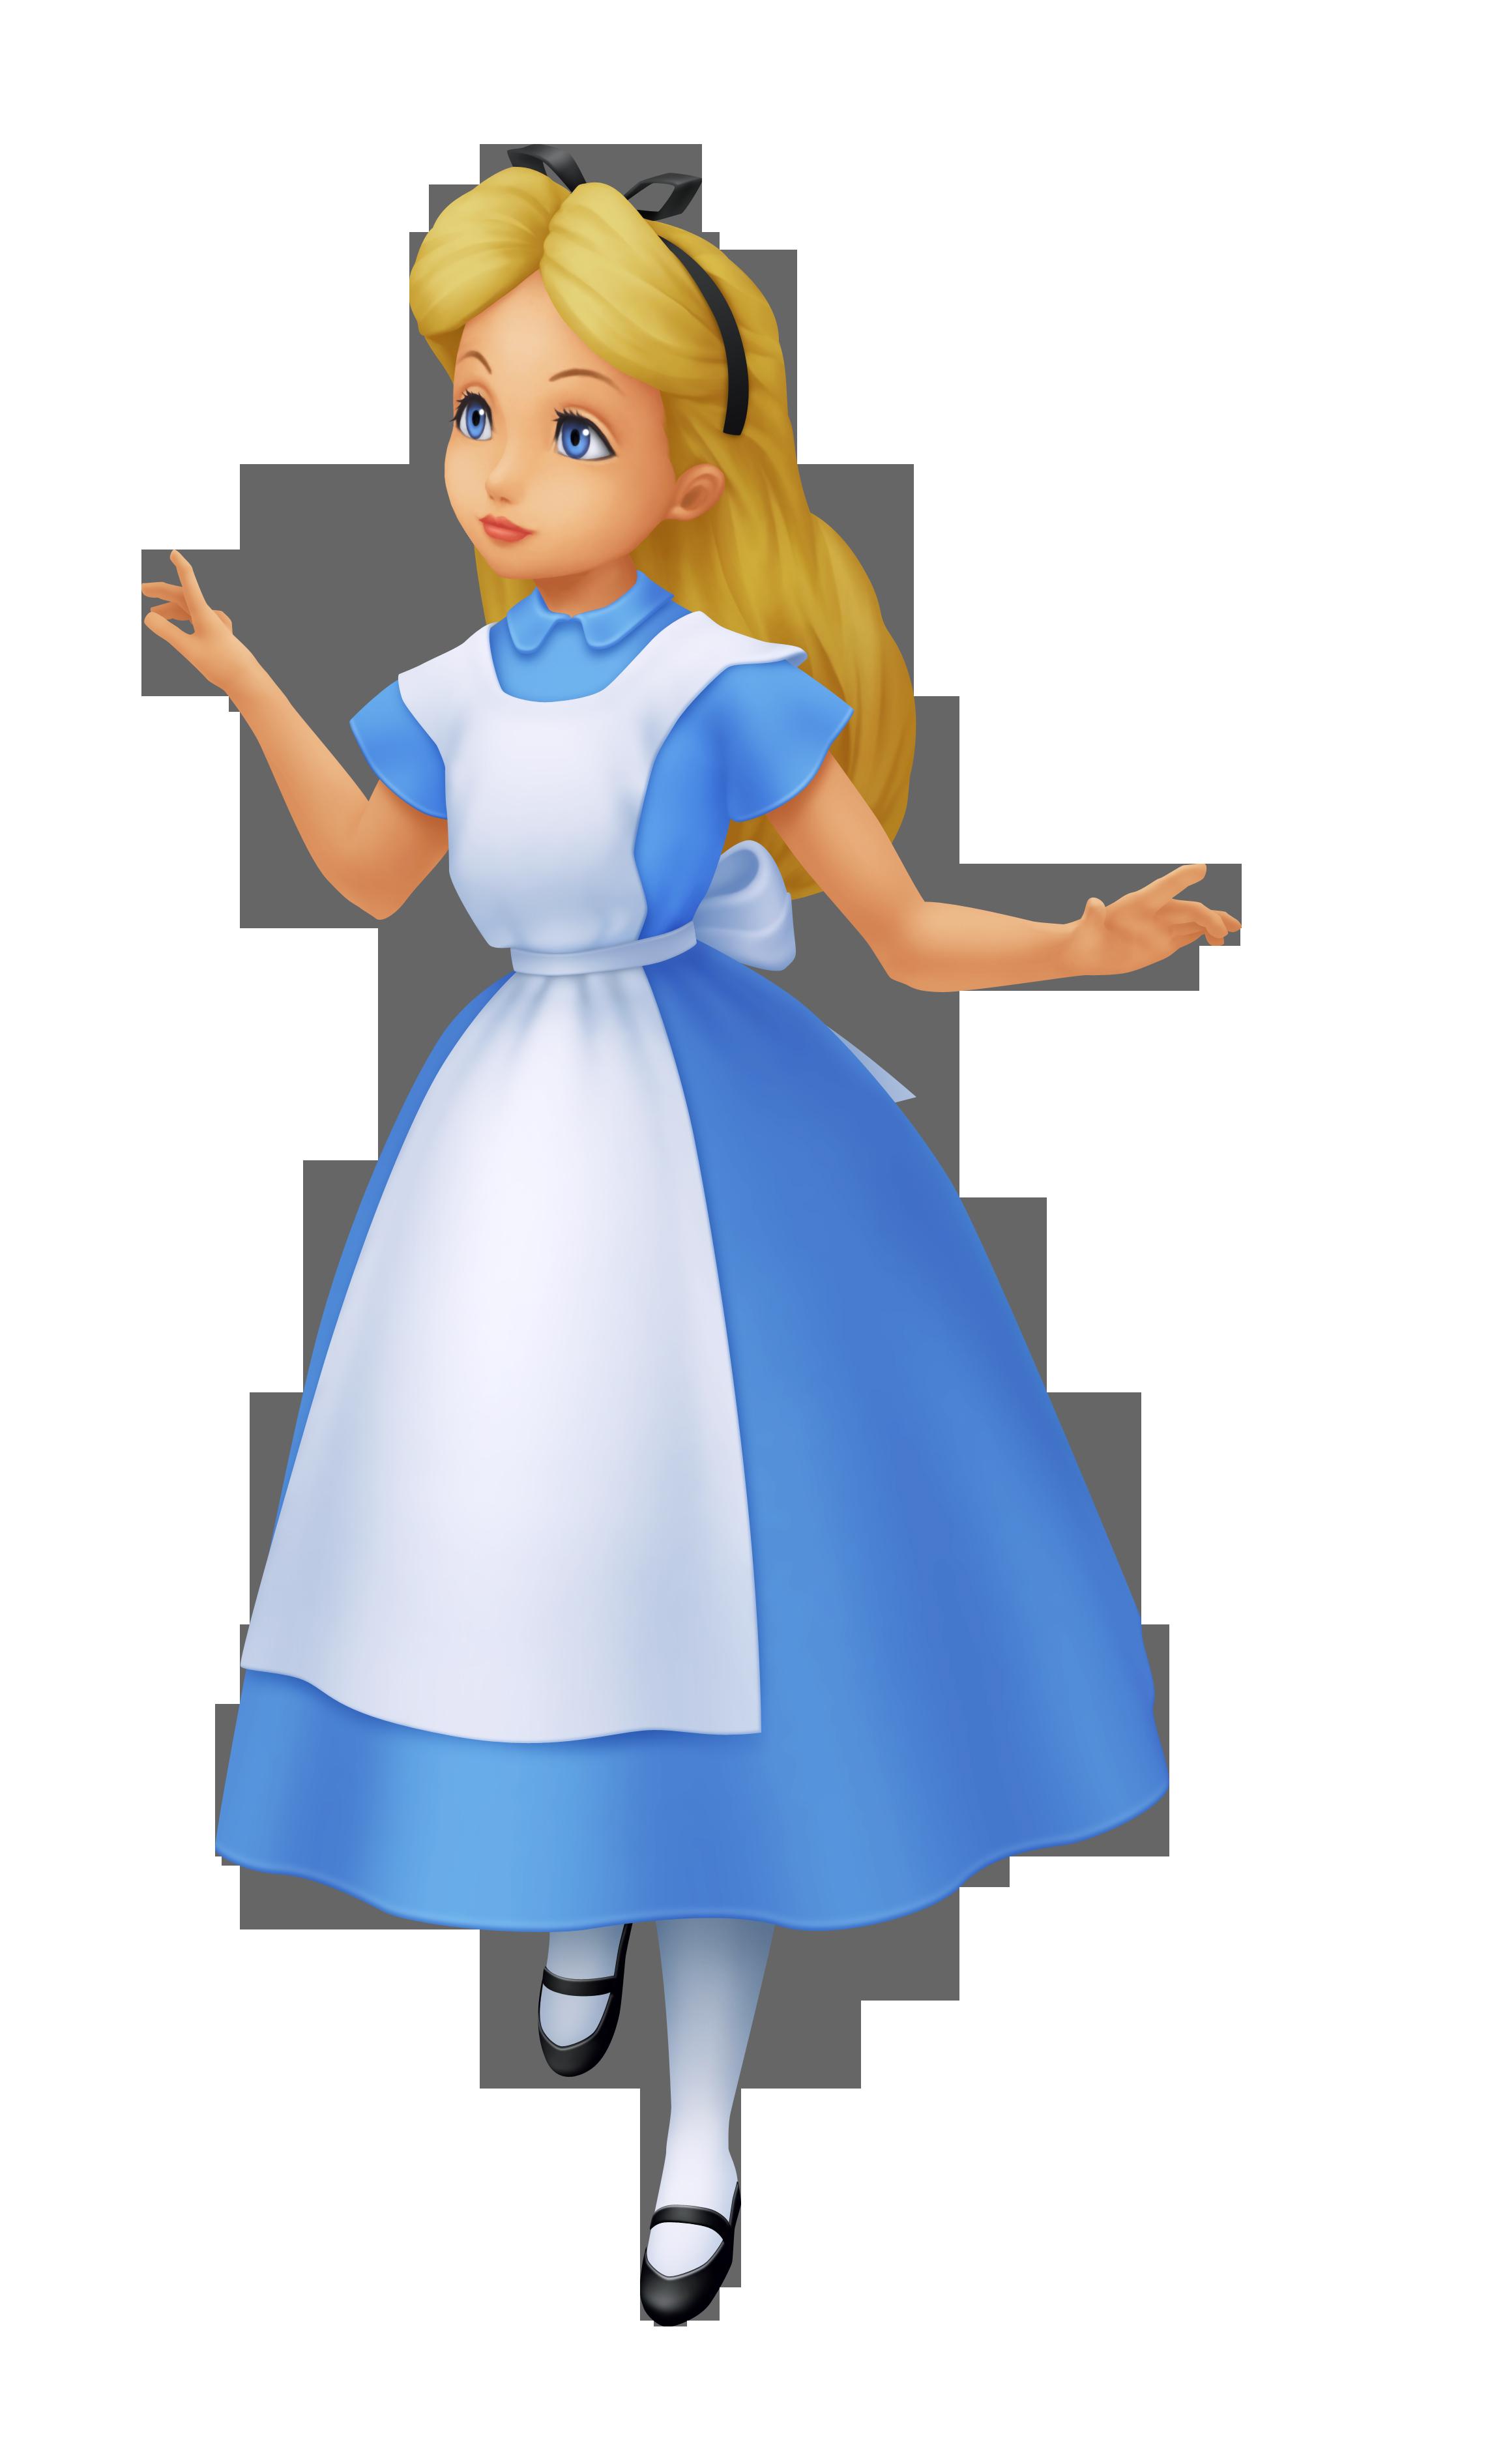 White apron alice wonderland costume - Kingdom Hearts Series Alice Khrec